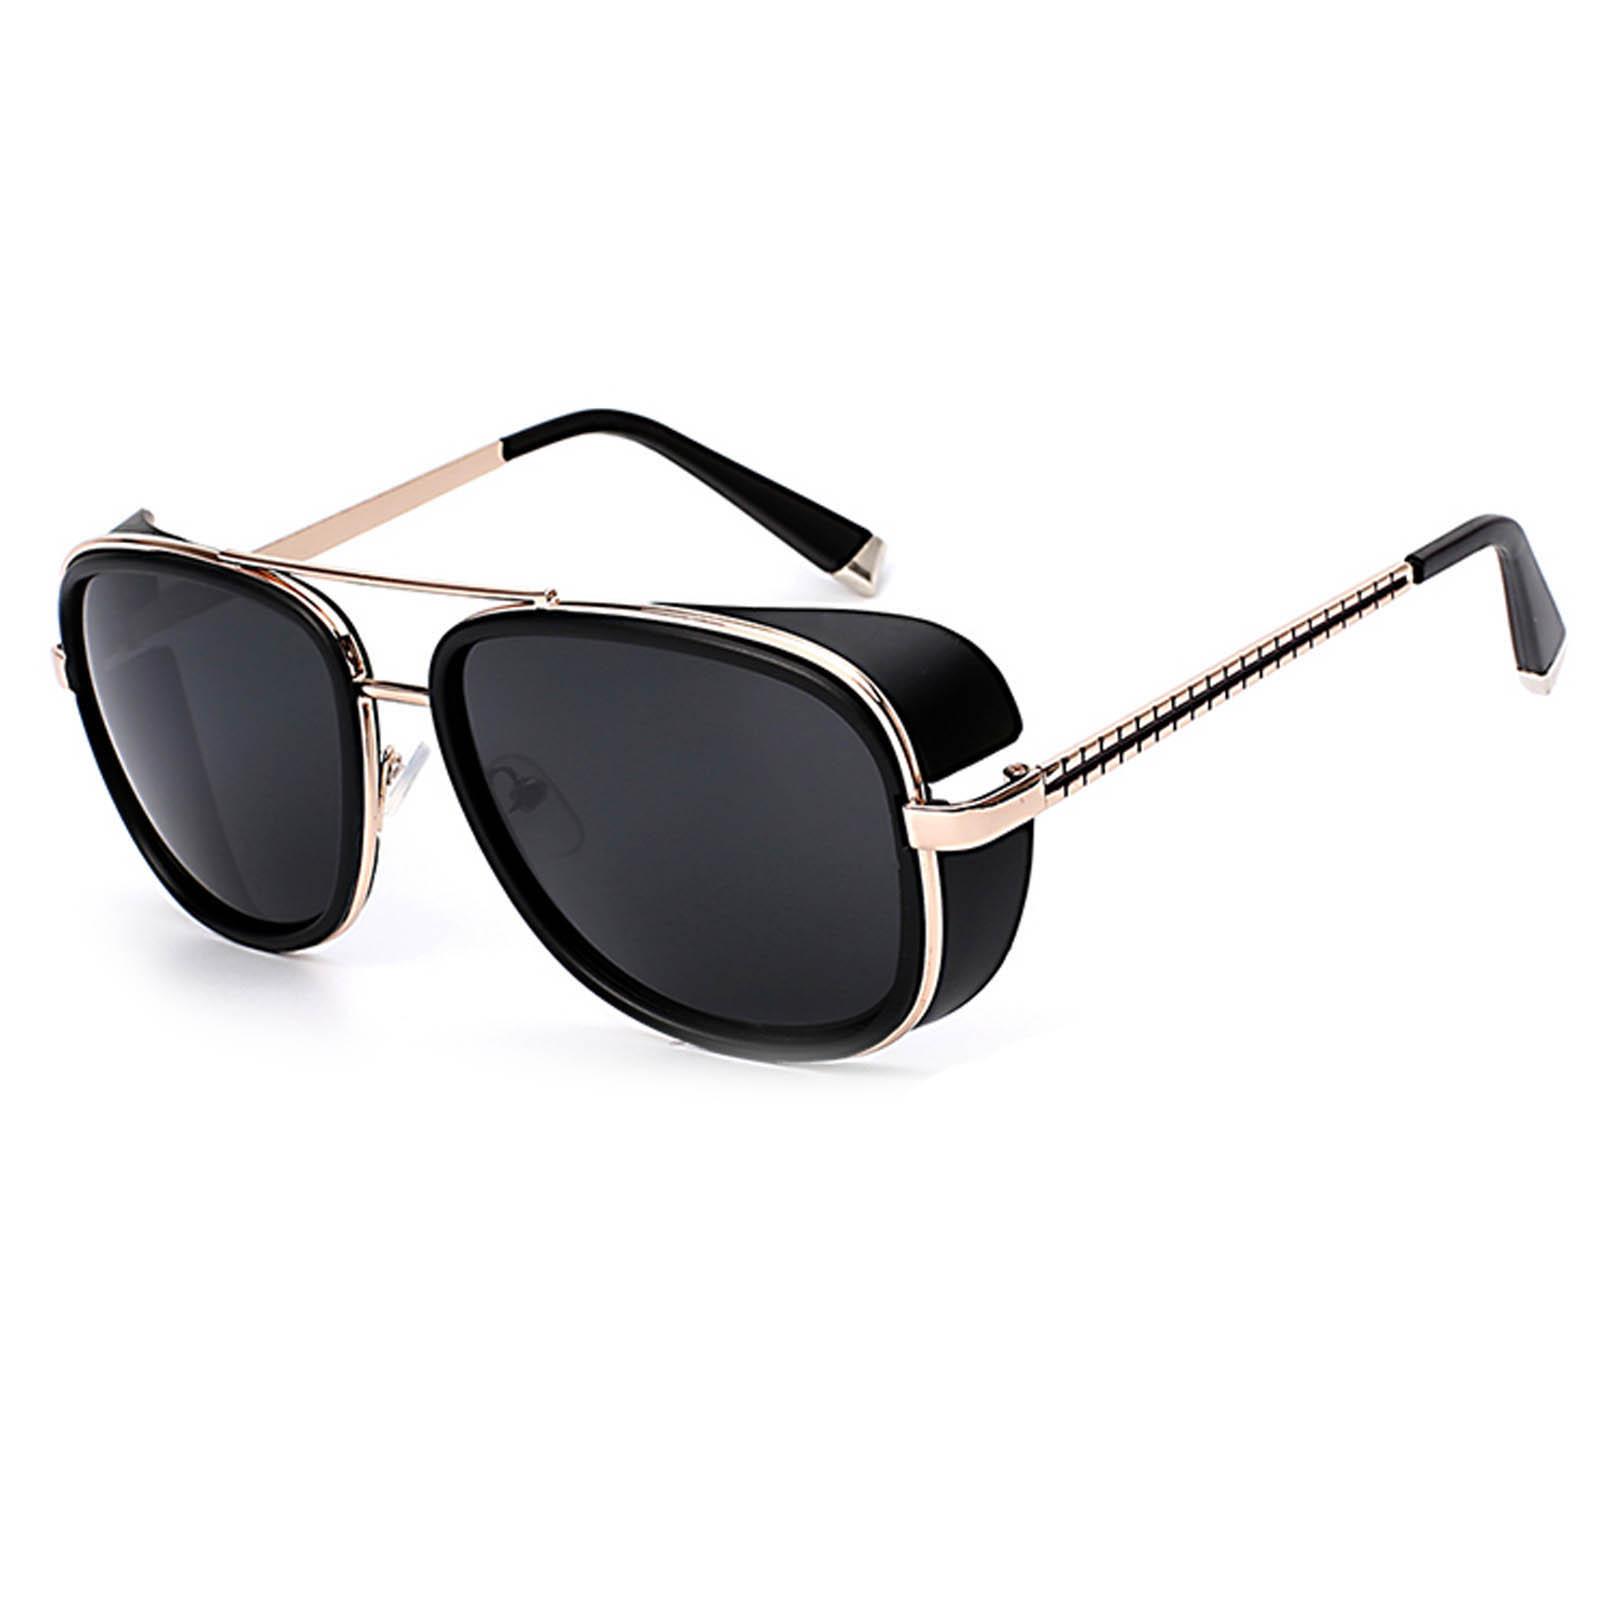 OWL ® 002 C6 Aviator Eyewear Sunglasses Women's Men's Metal Black Frame Black Lens One Pair